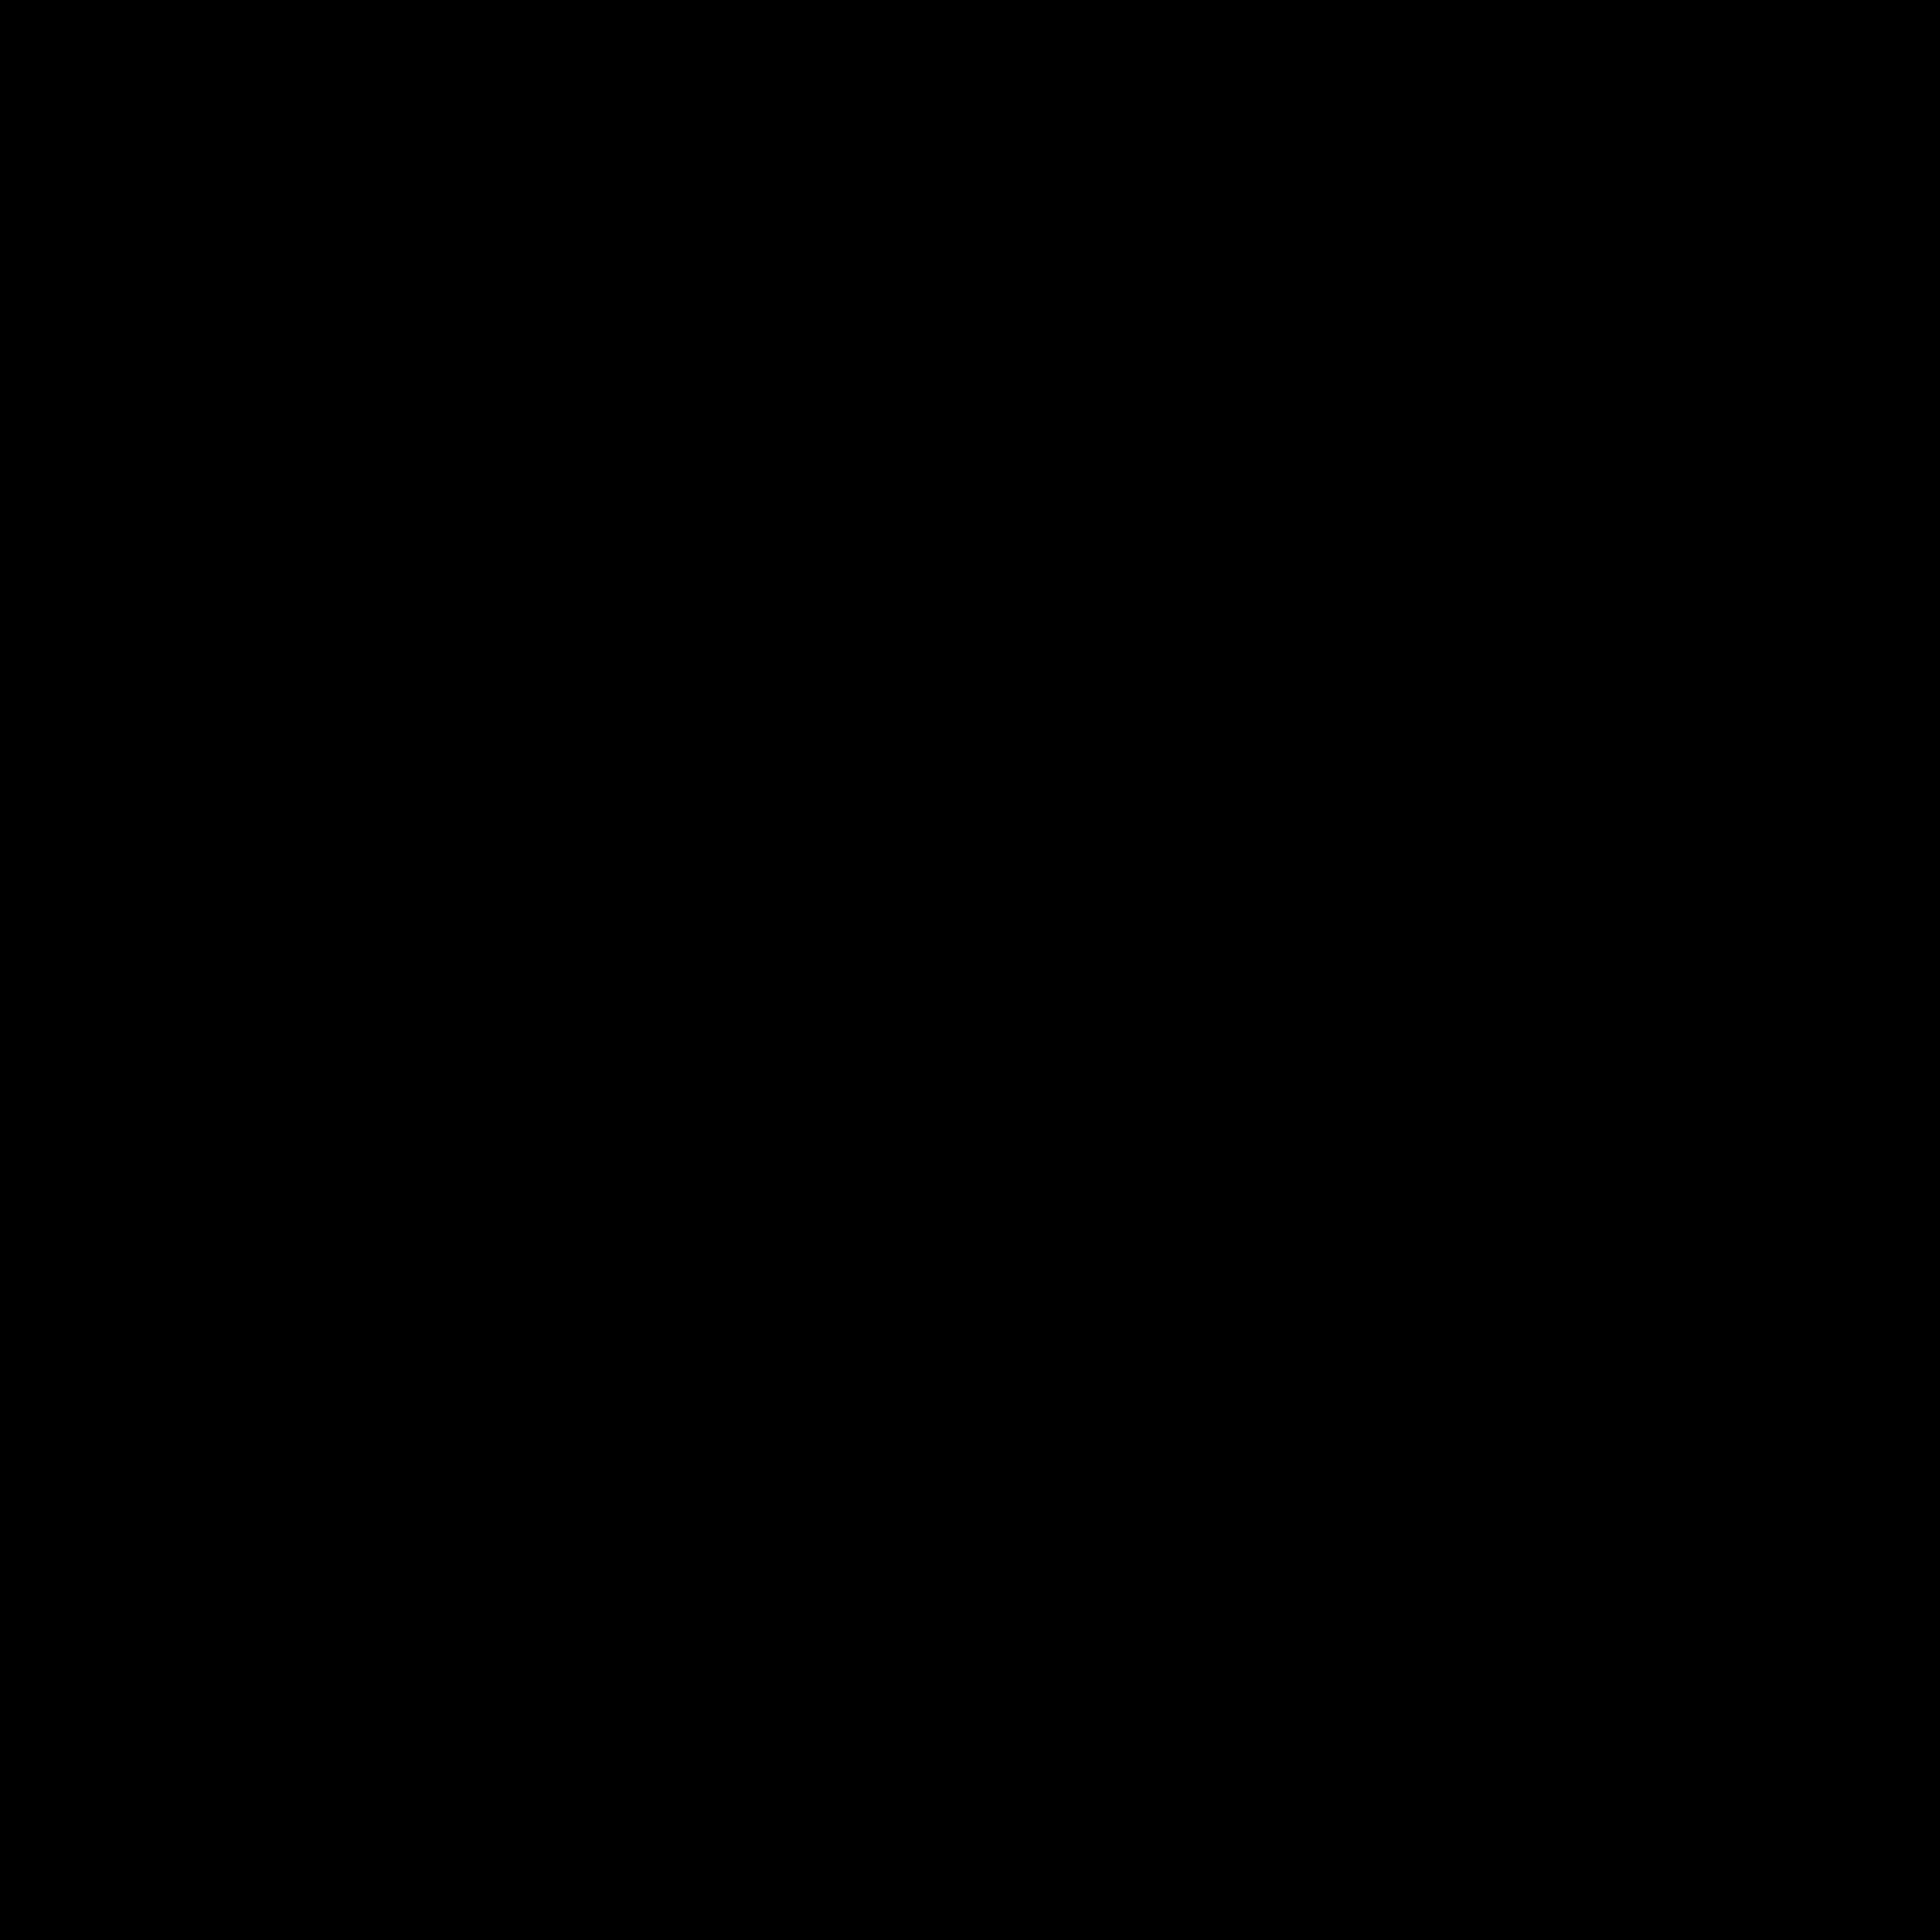 Beta decay feynman diagram google search radioactivity pinterest pooptronica